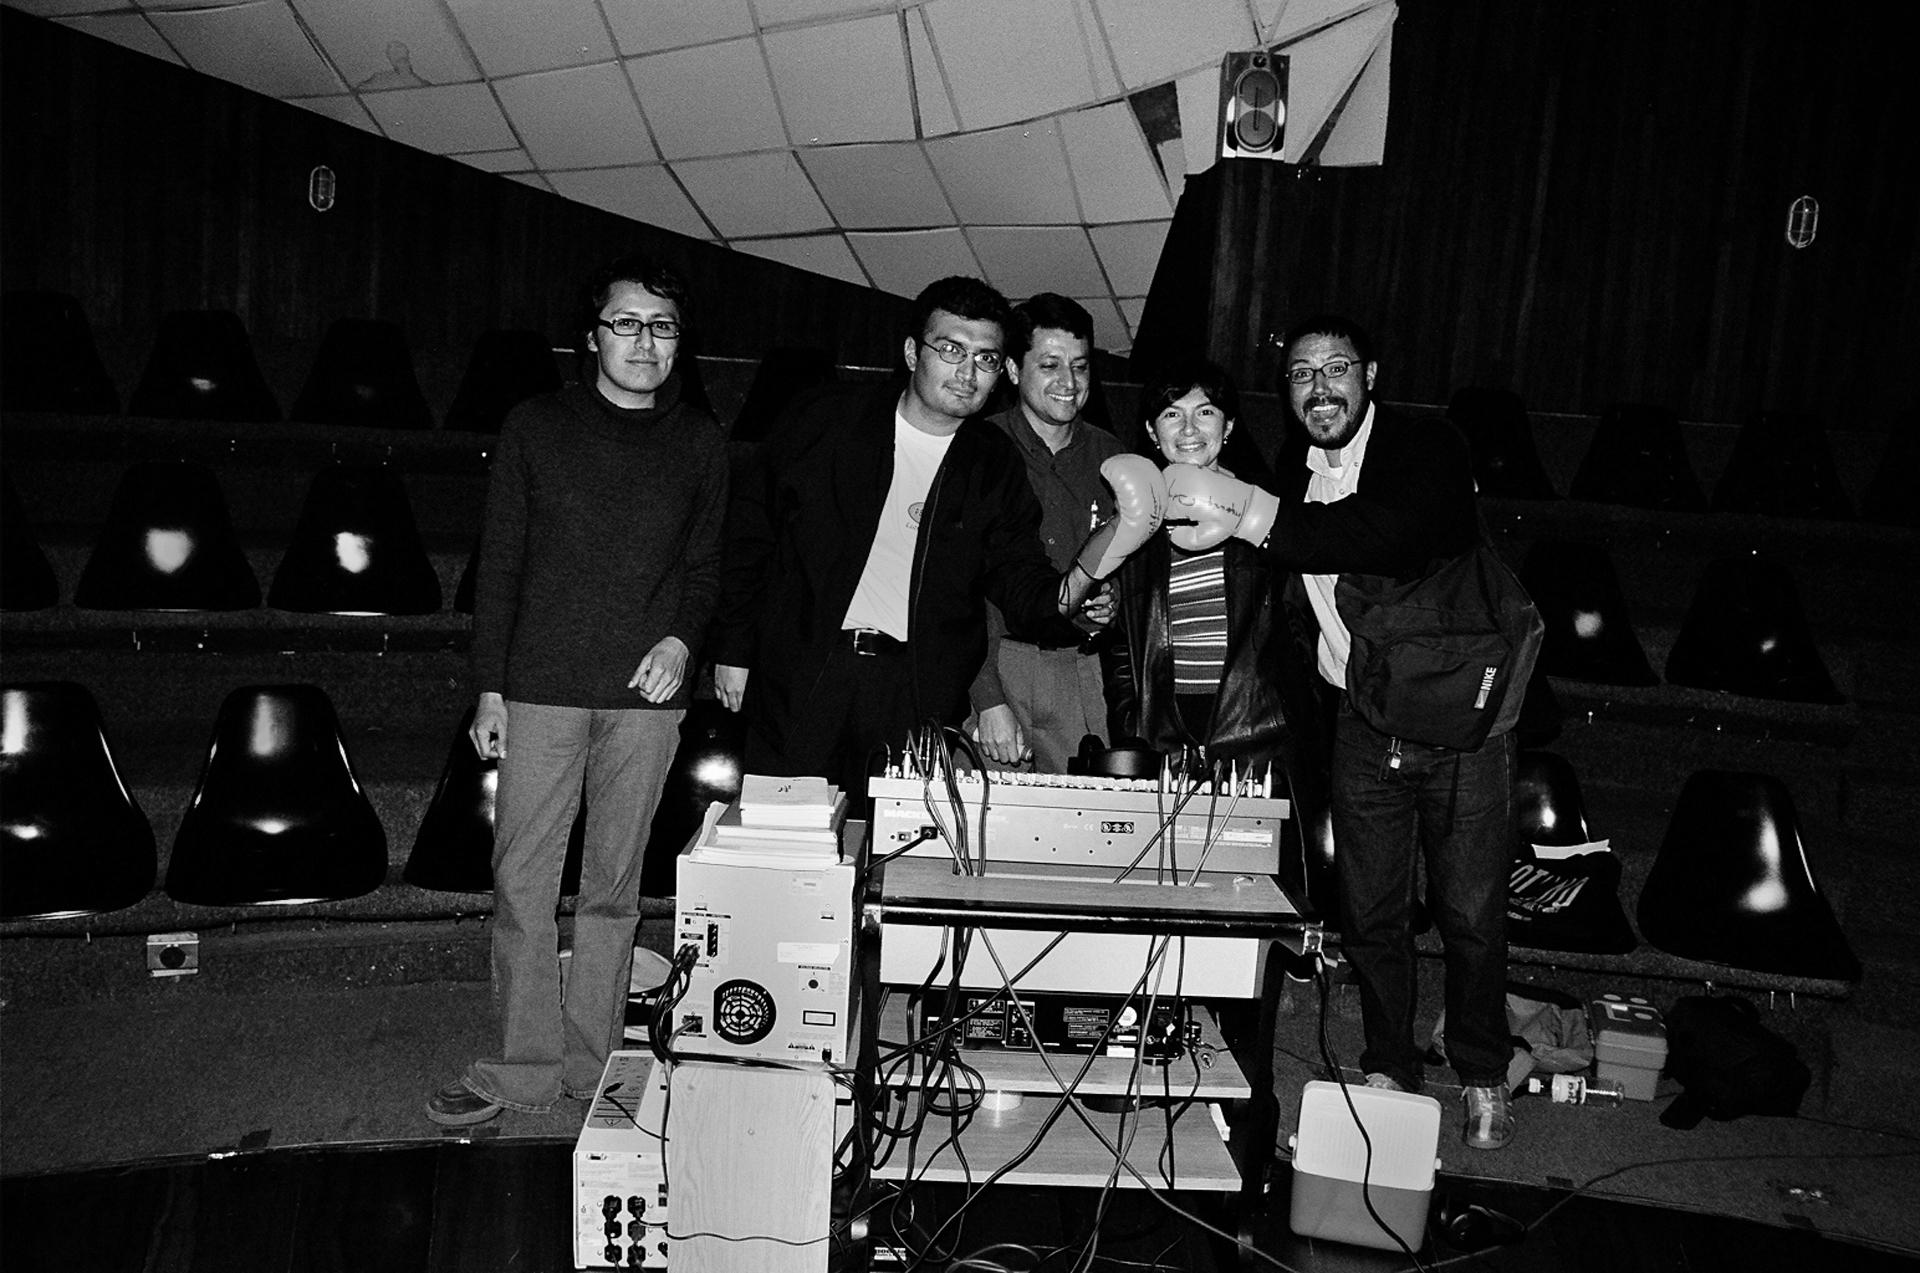 Fabiano Kueva, Luis Carlos Mussó, Byron Azuero, Cárol Murillo y Edwin Madrid.